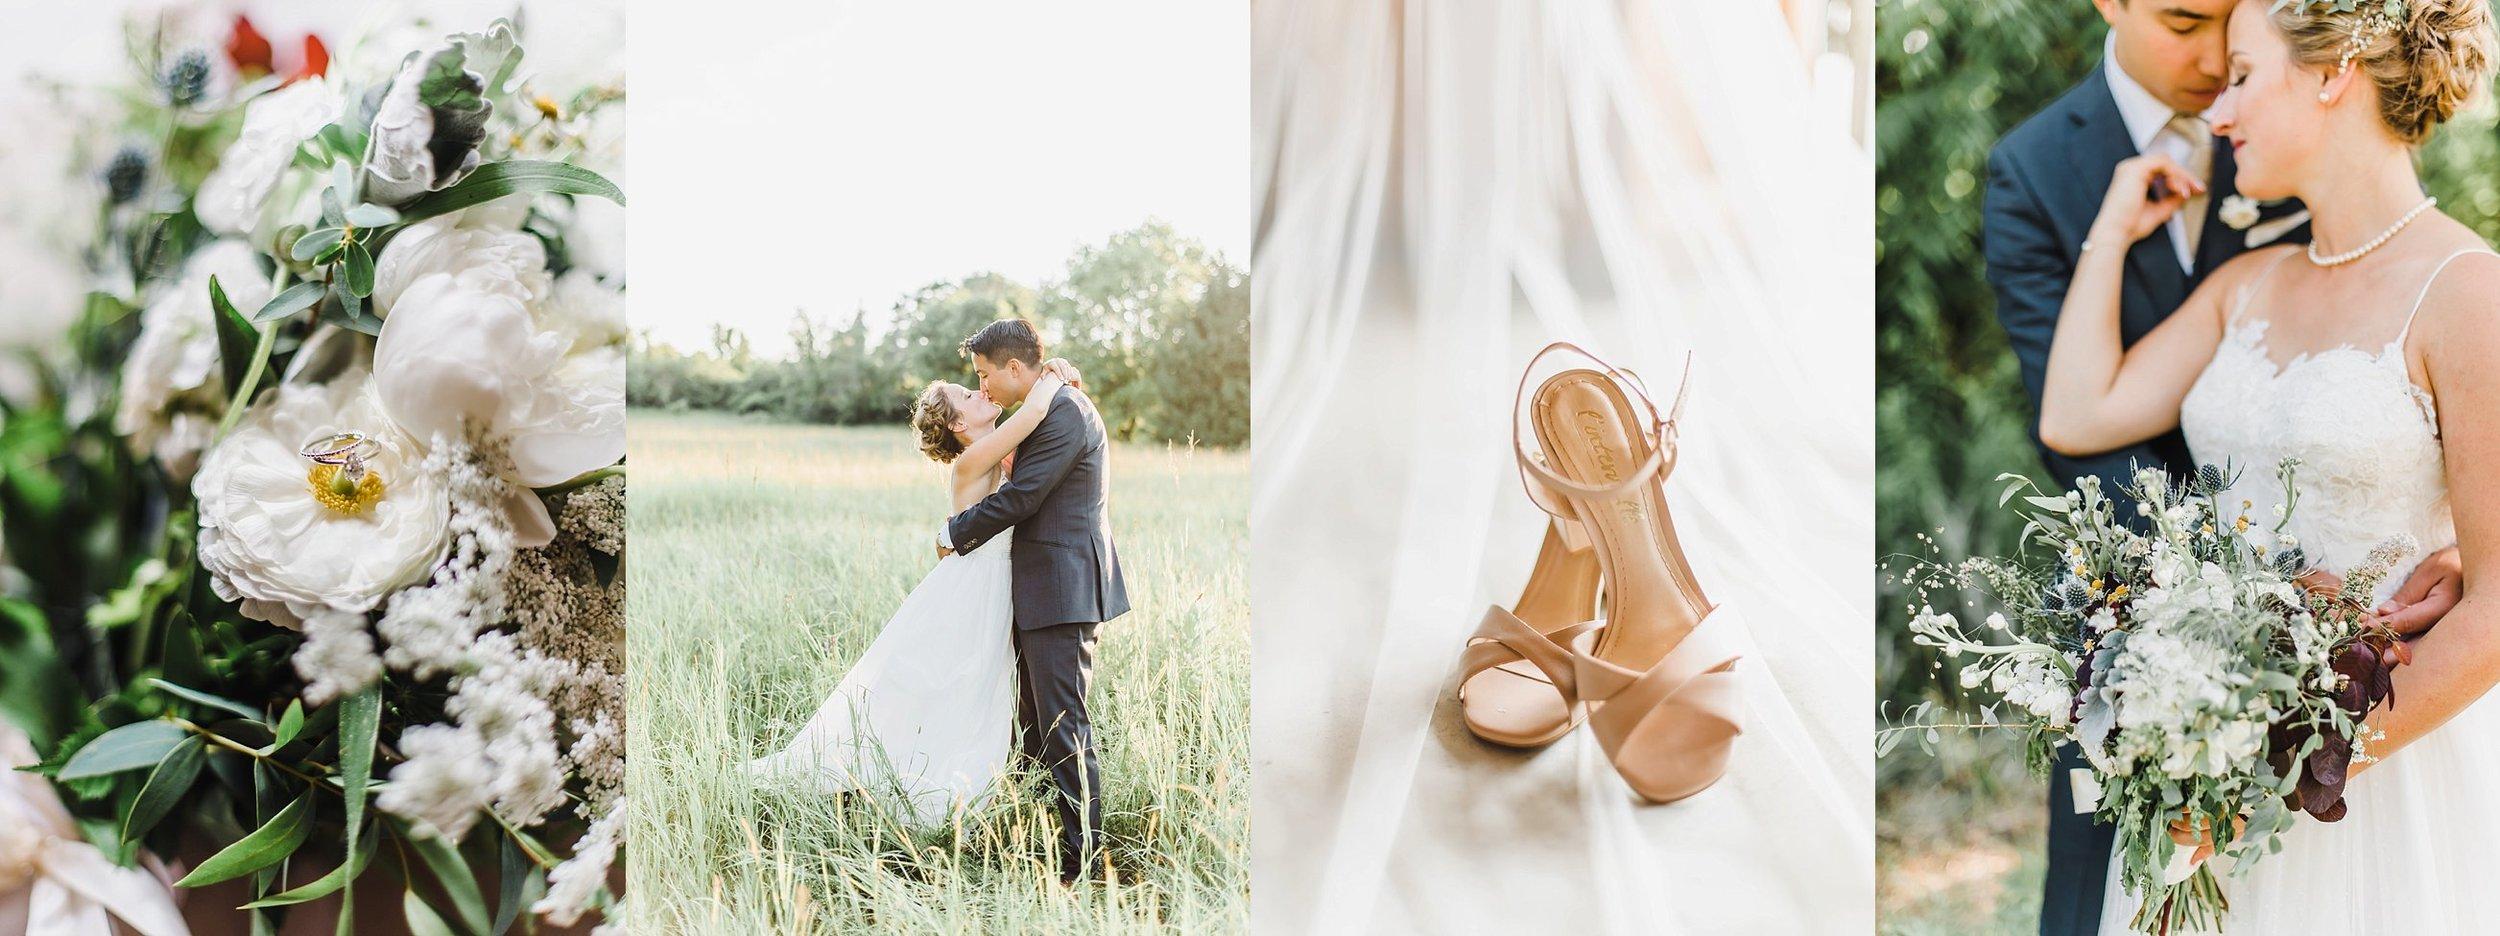 light airy indie fine art ottawa wedding photographer | Ali and Batoul Photography_0924.jpg